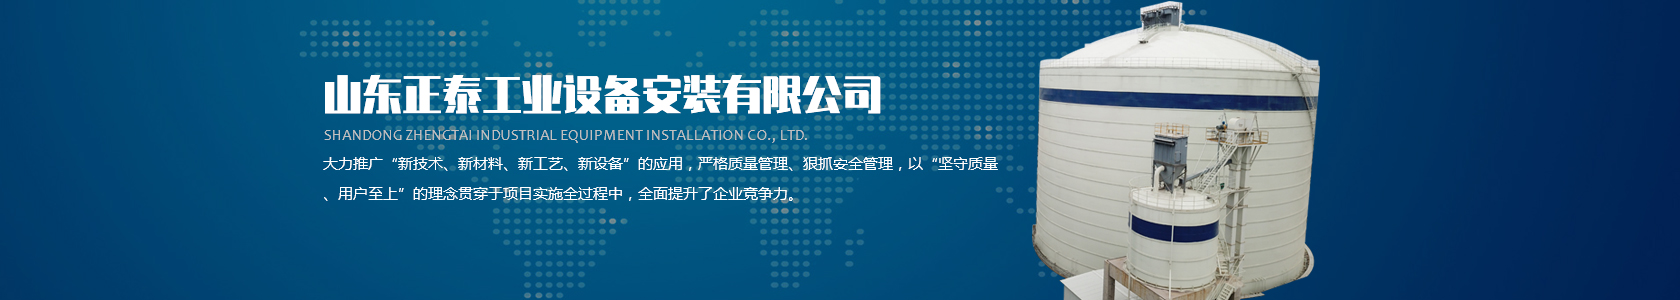 shan东gunqiu平tai工业she备安zhuangyou限公司